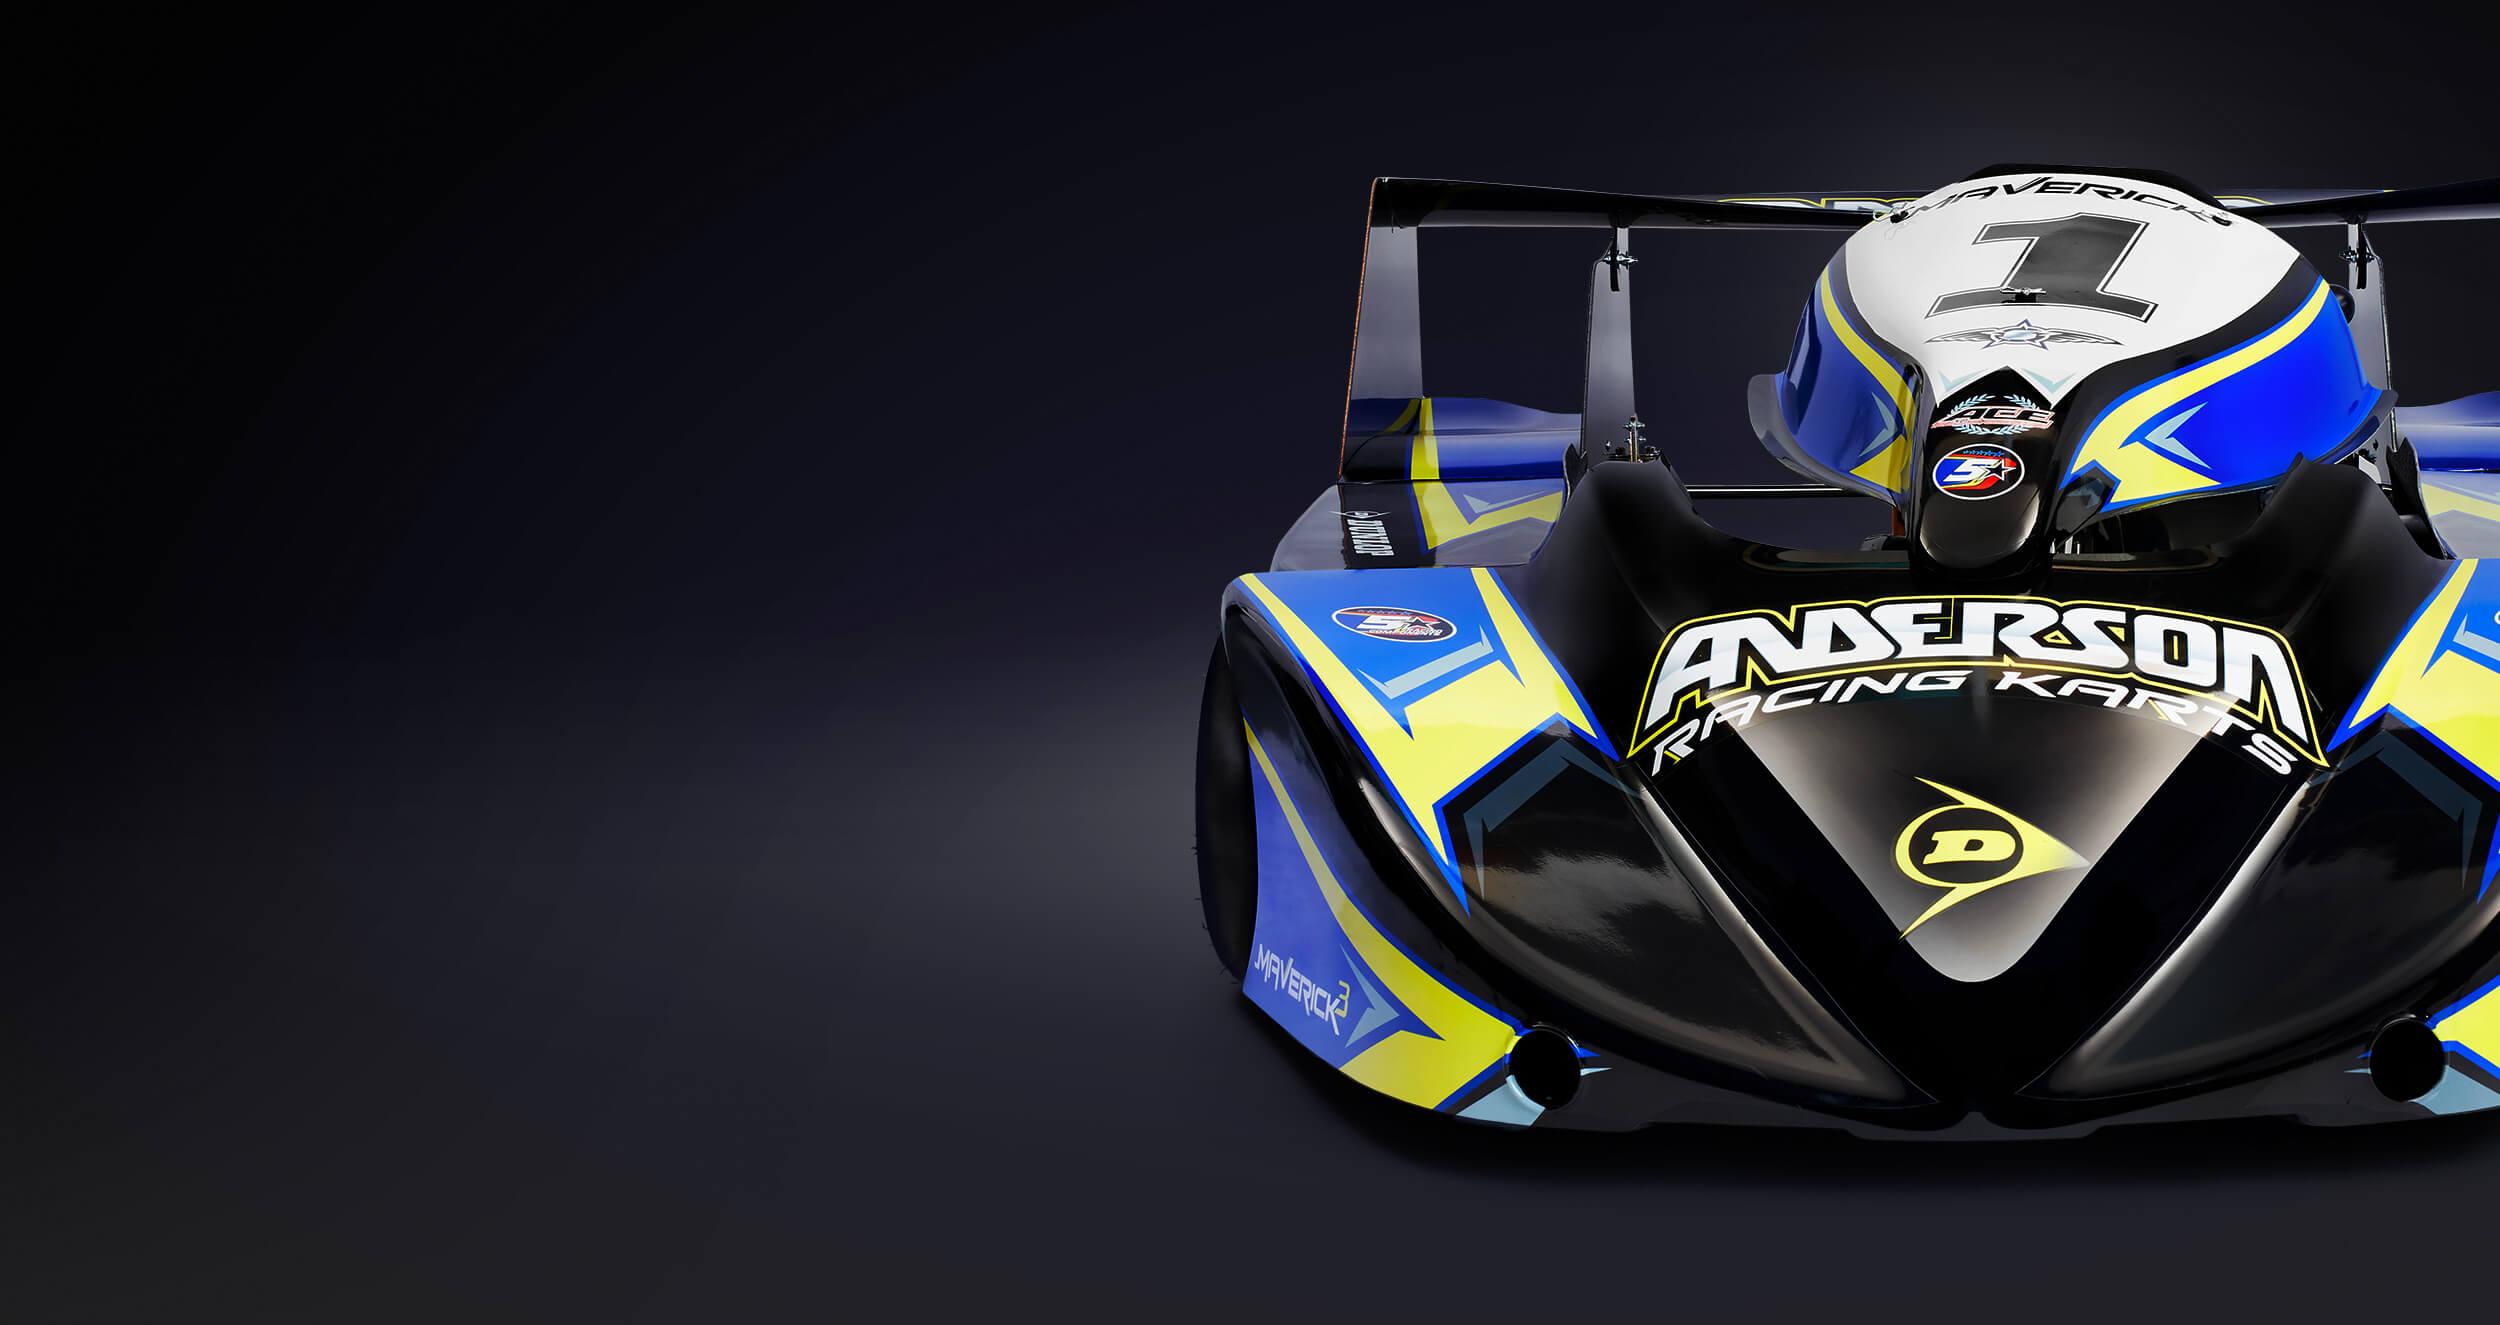 Anderson Karts Marverick 3 250 Mono Superkart